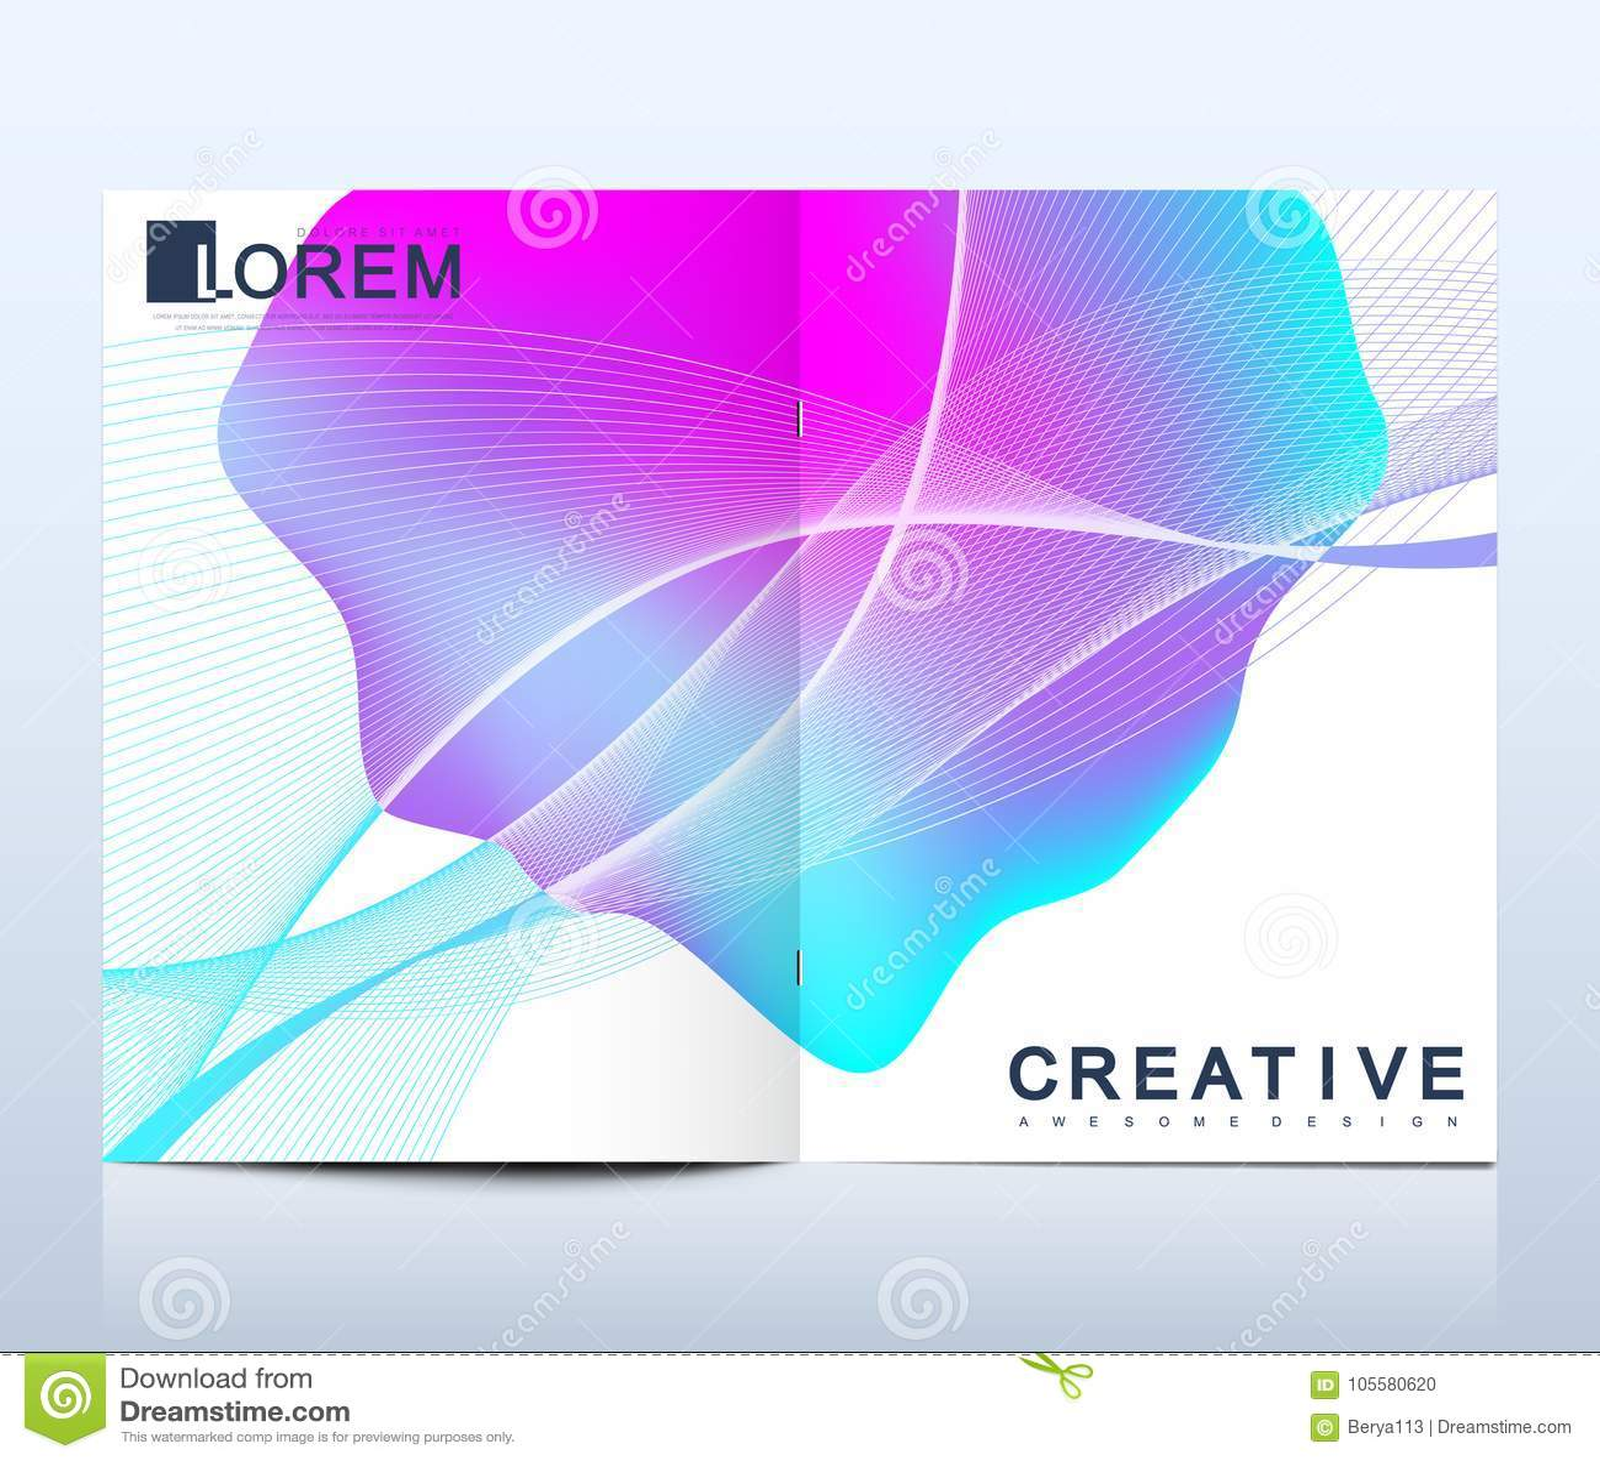 modern vector template for bi fold brochure leaflet flyer cover